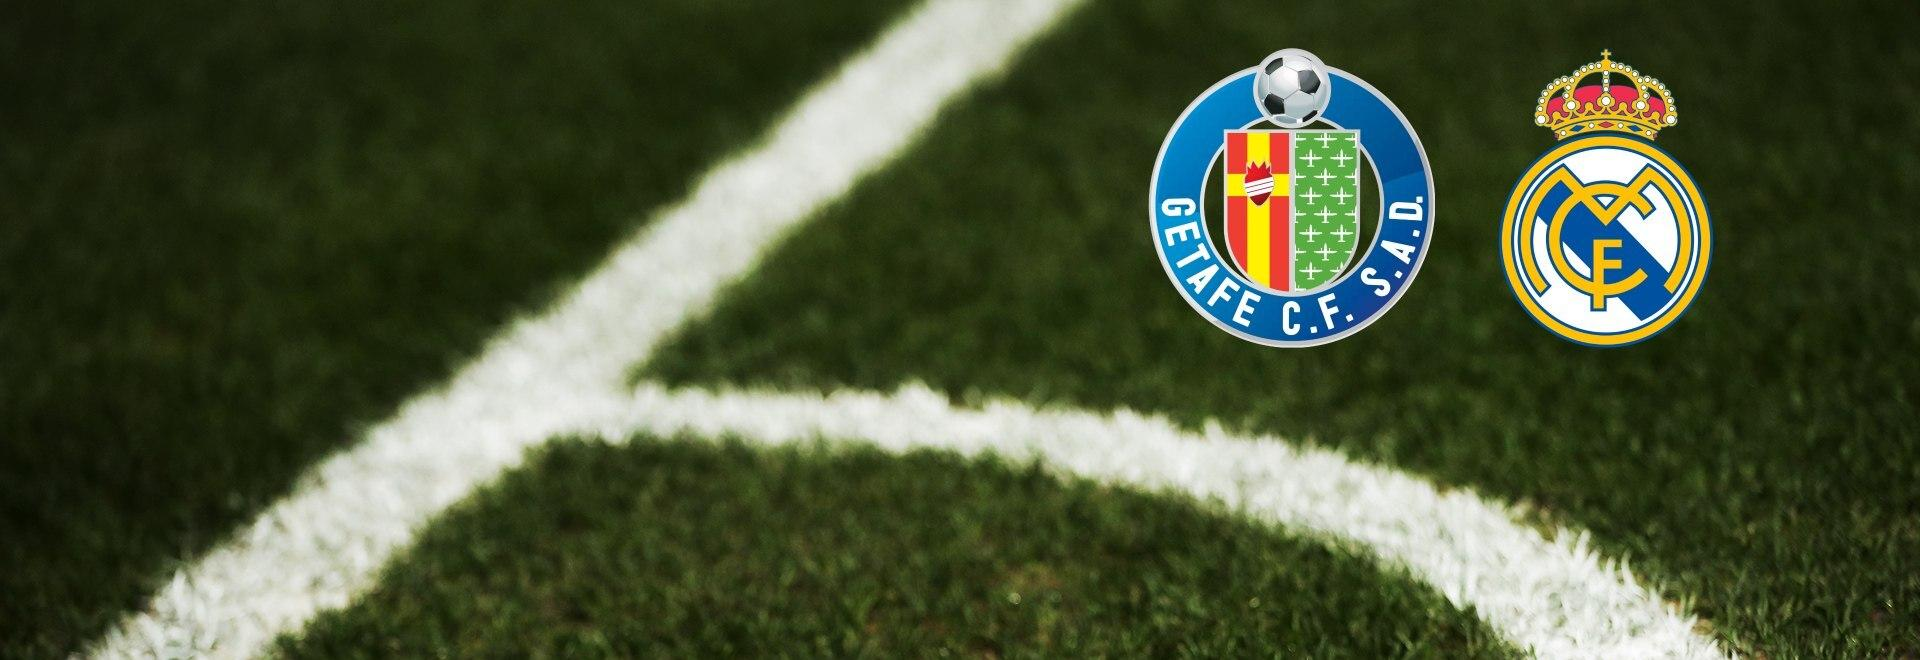 Getafe - Real Madrid. 19a g.